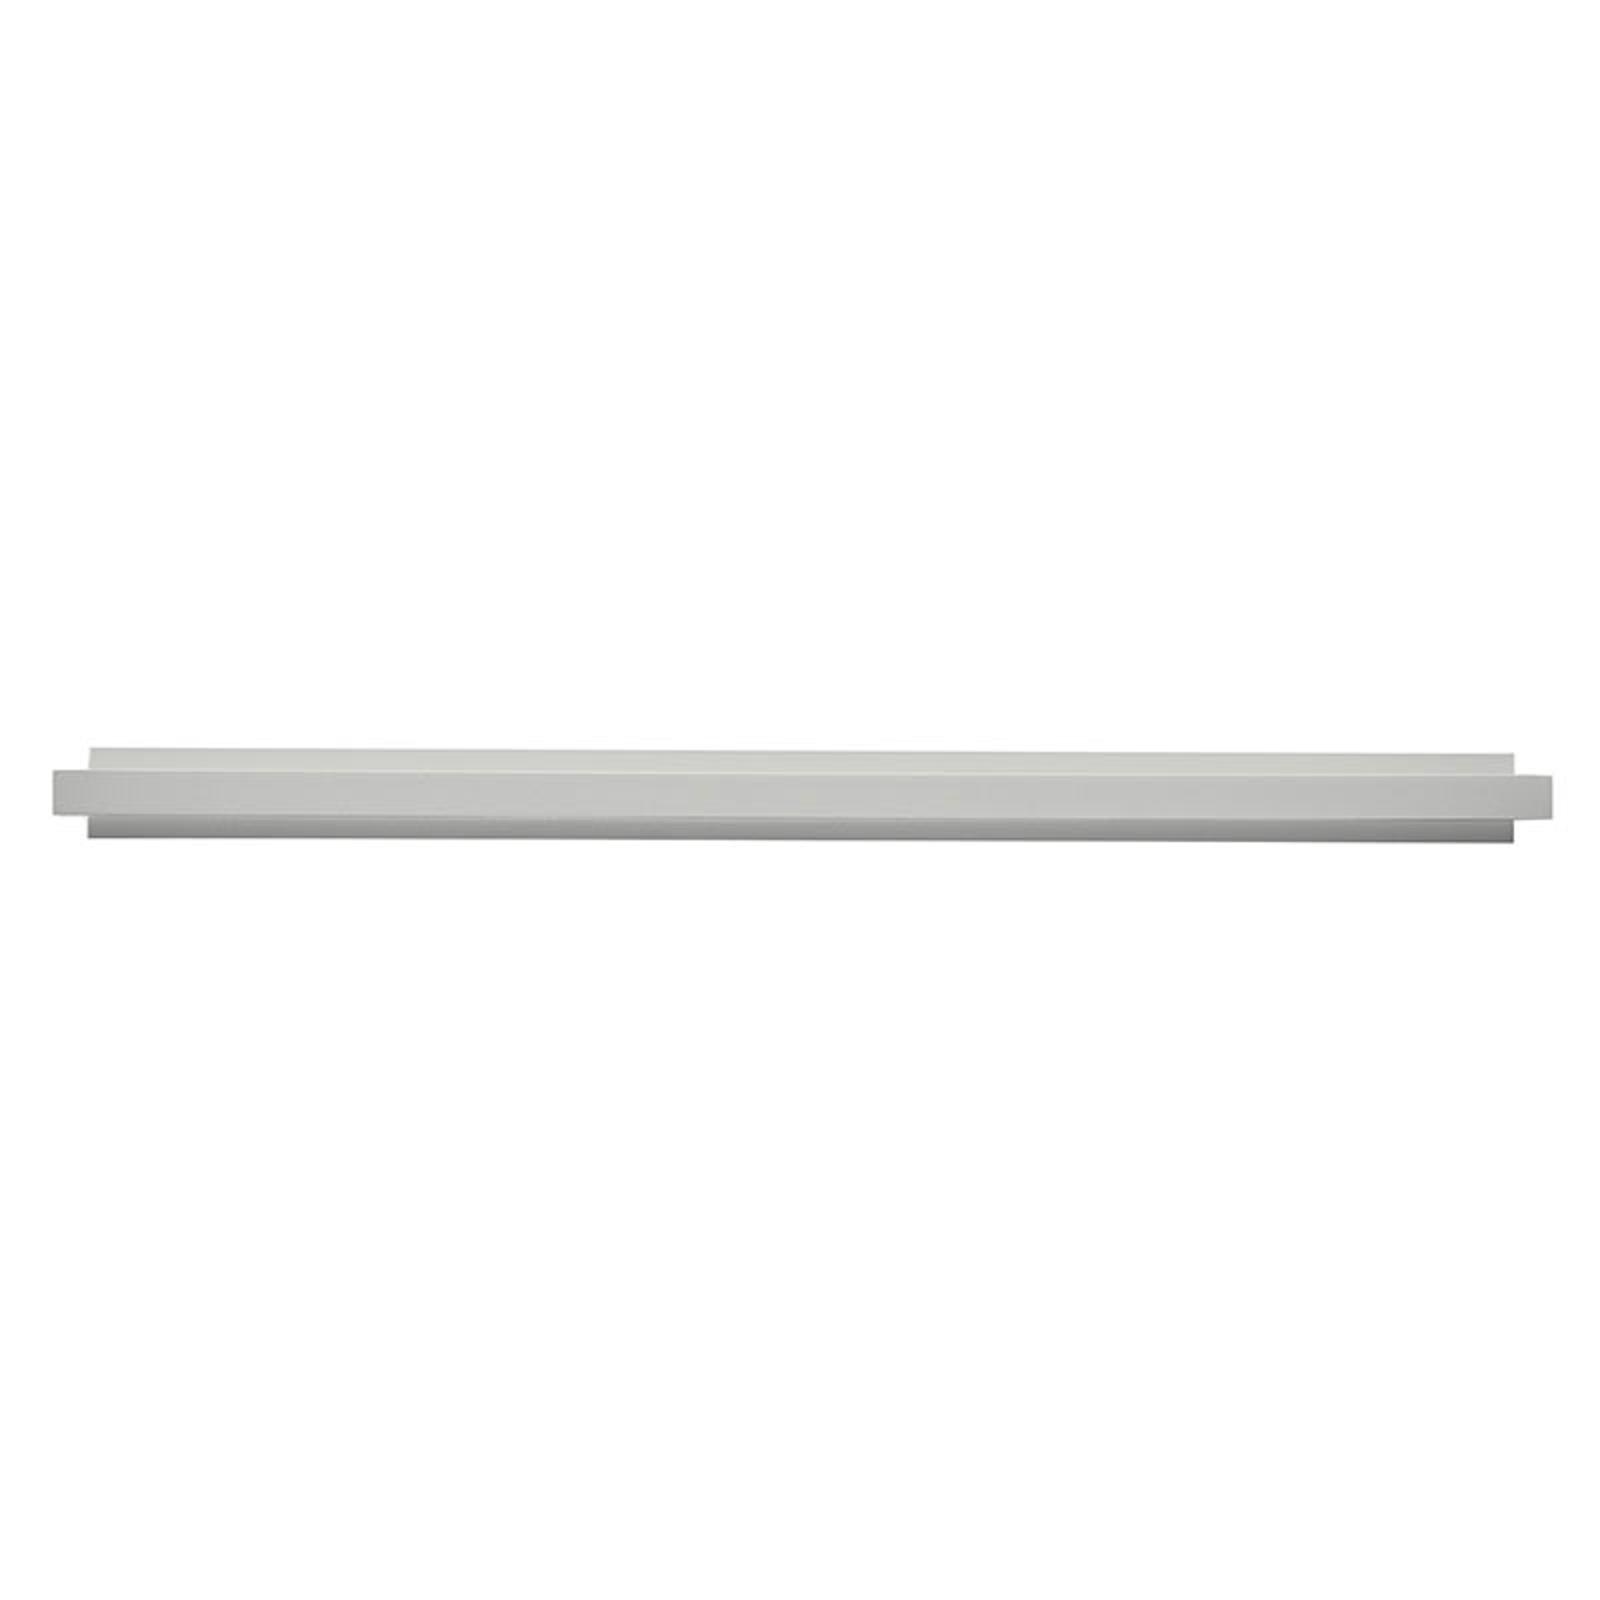 LED wandlamp tablet W1, breedte 96 cm, wit